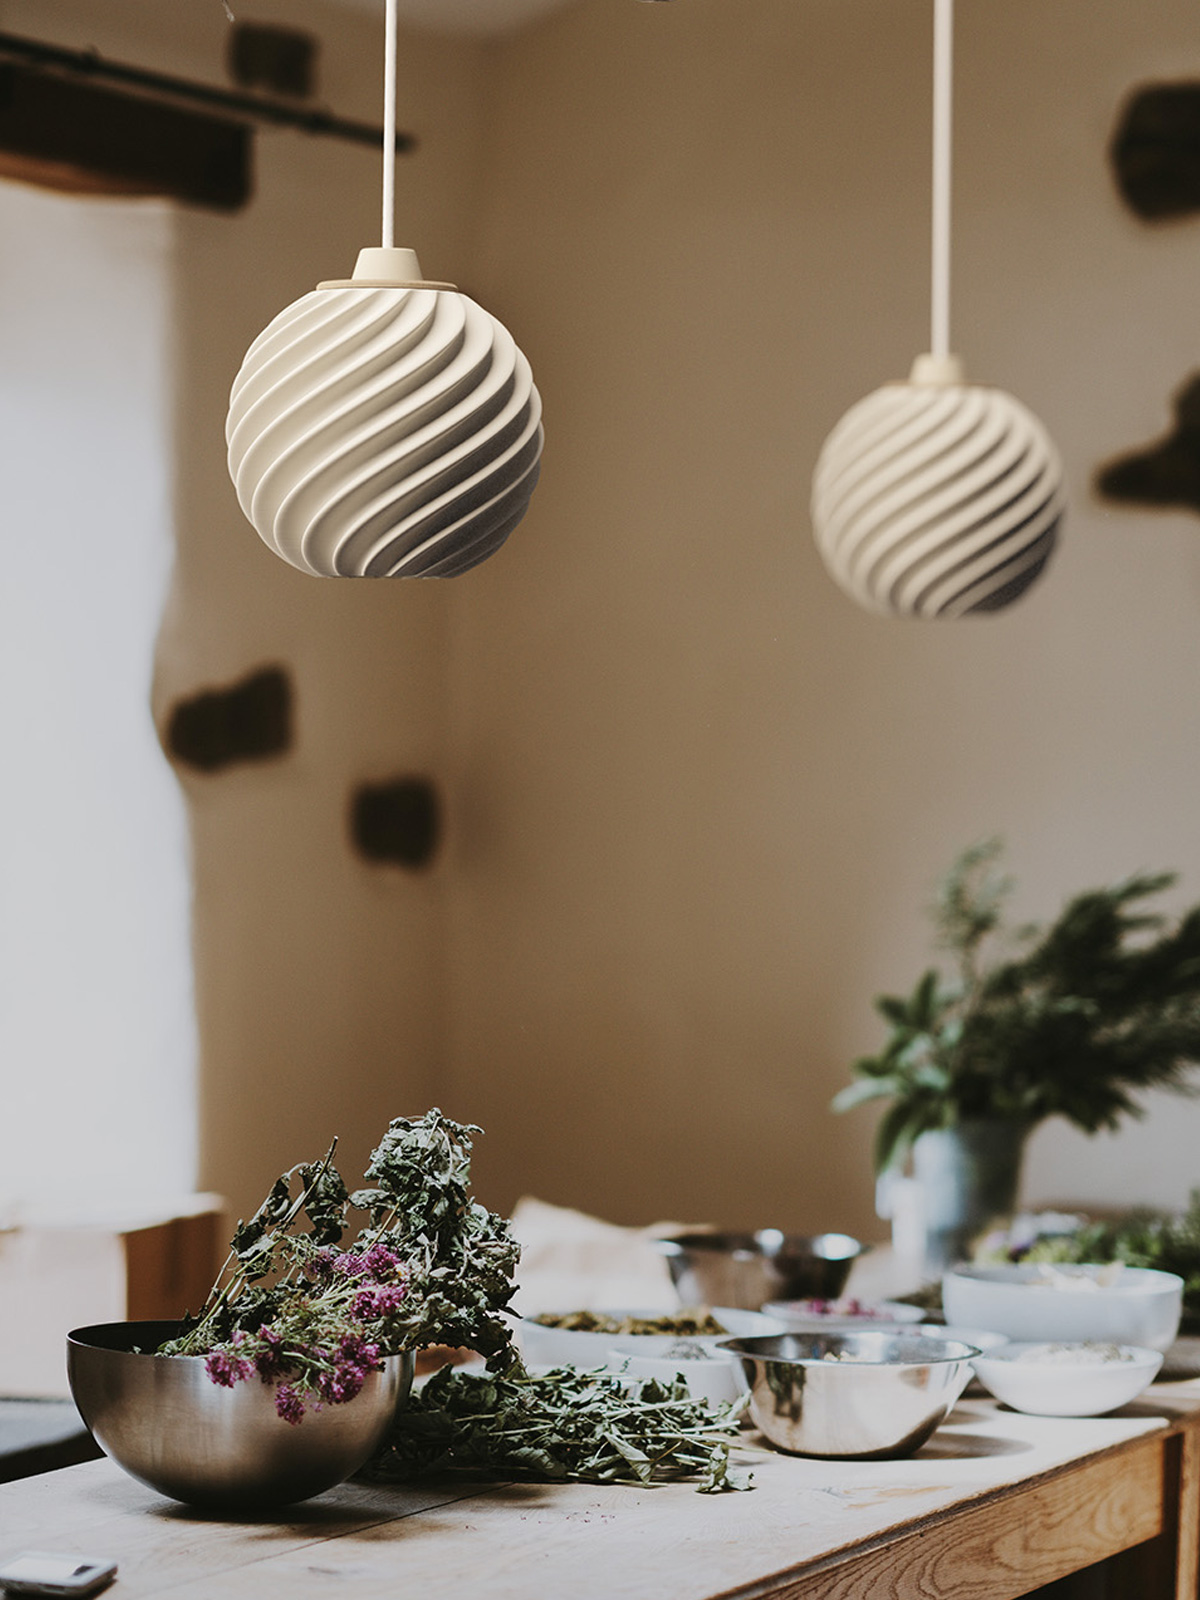 Polyluma Mono Ripple Designerleuchte aus Berlin nachhaltig Holz